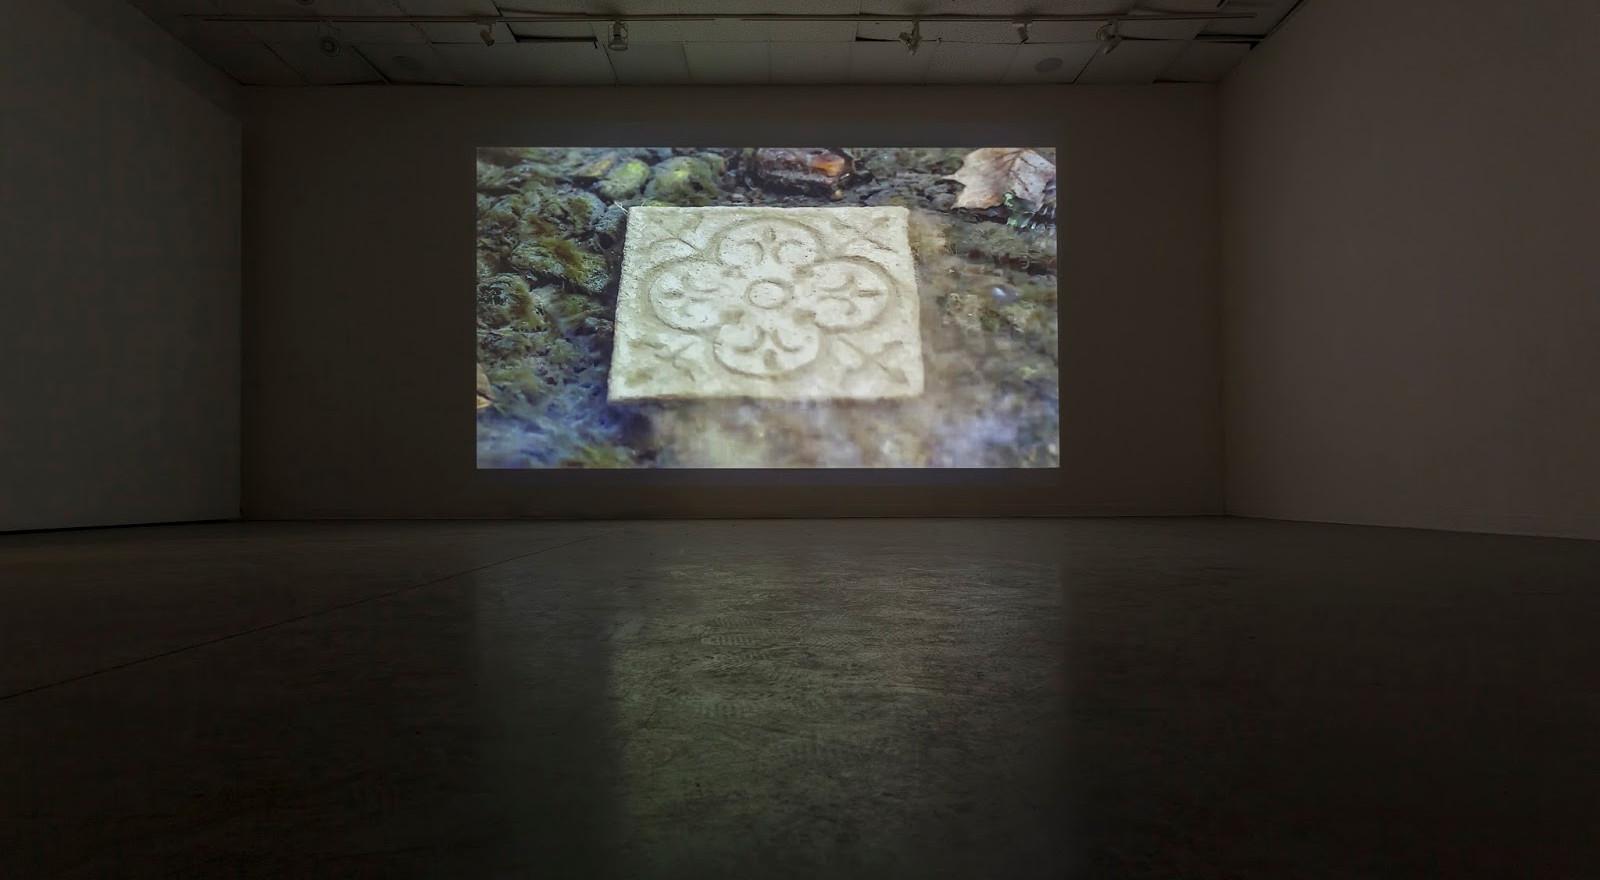 Tile flow - 1, 2017